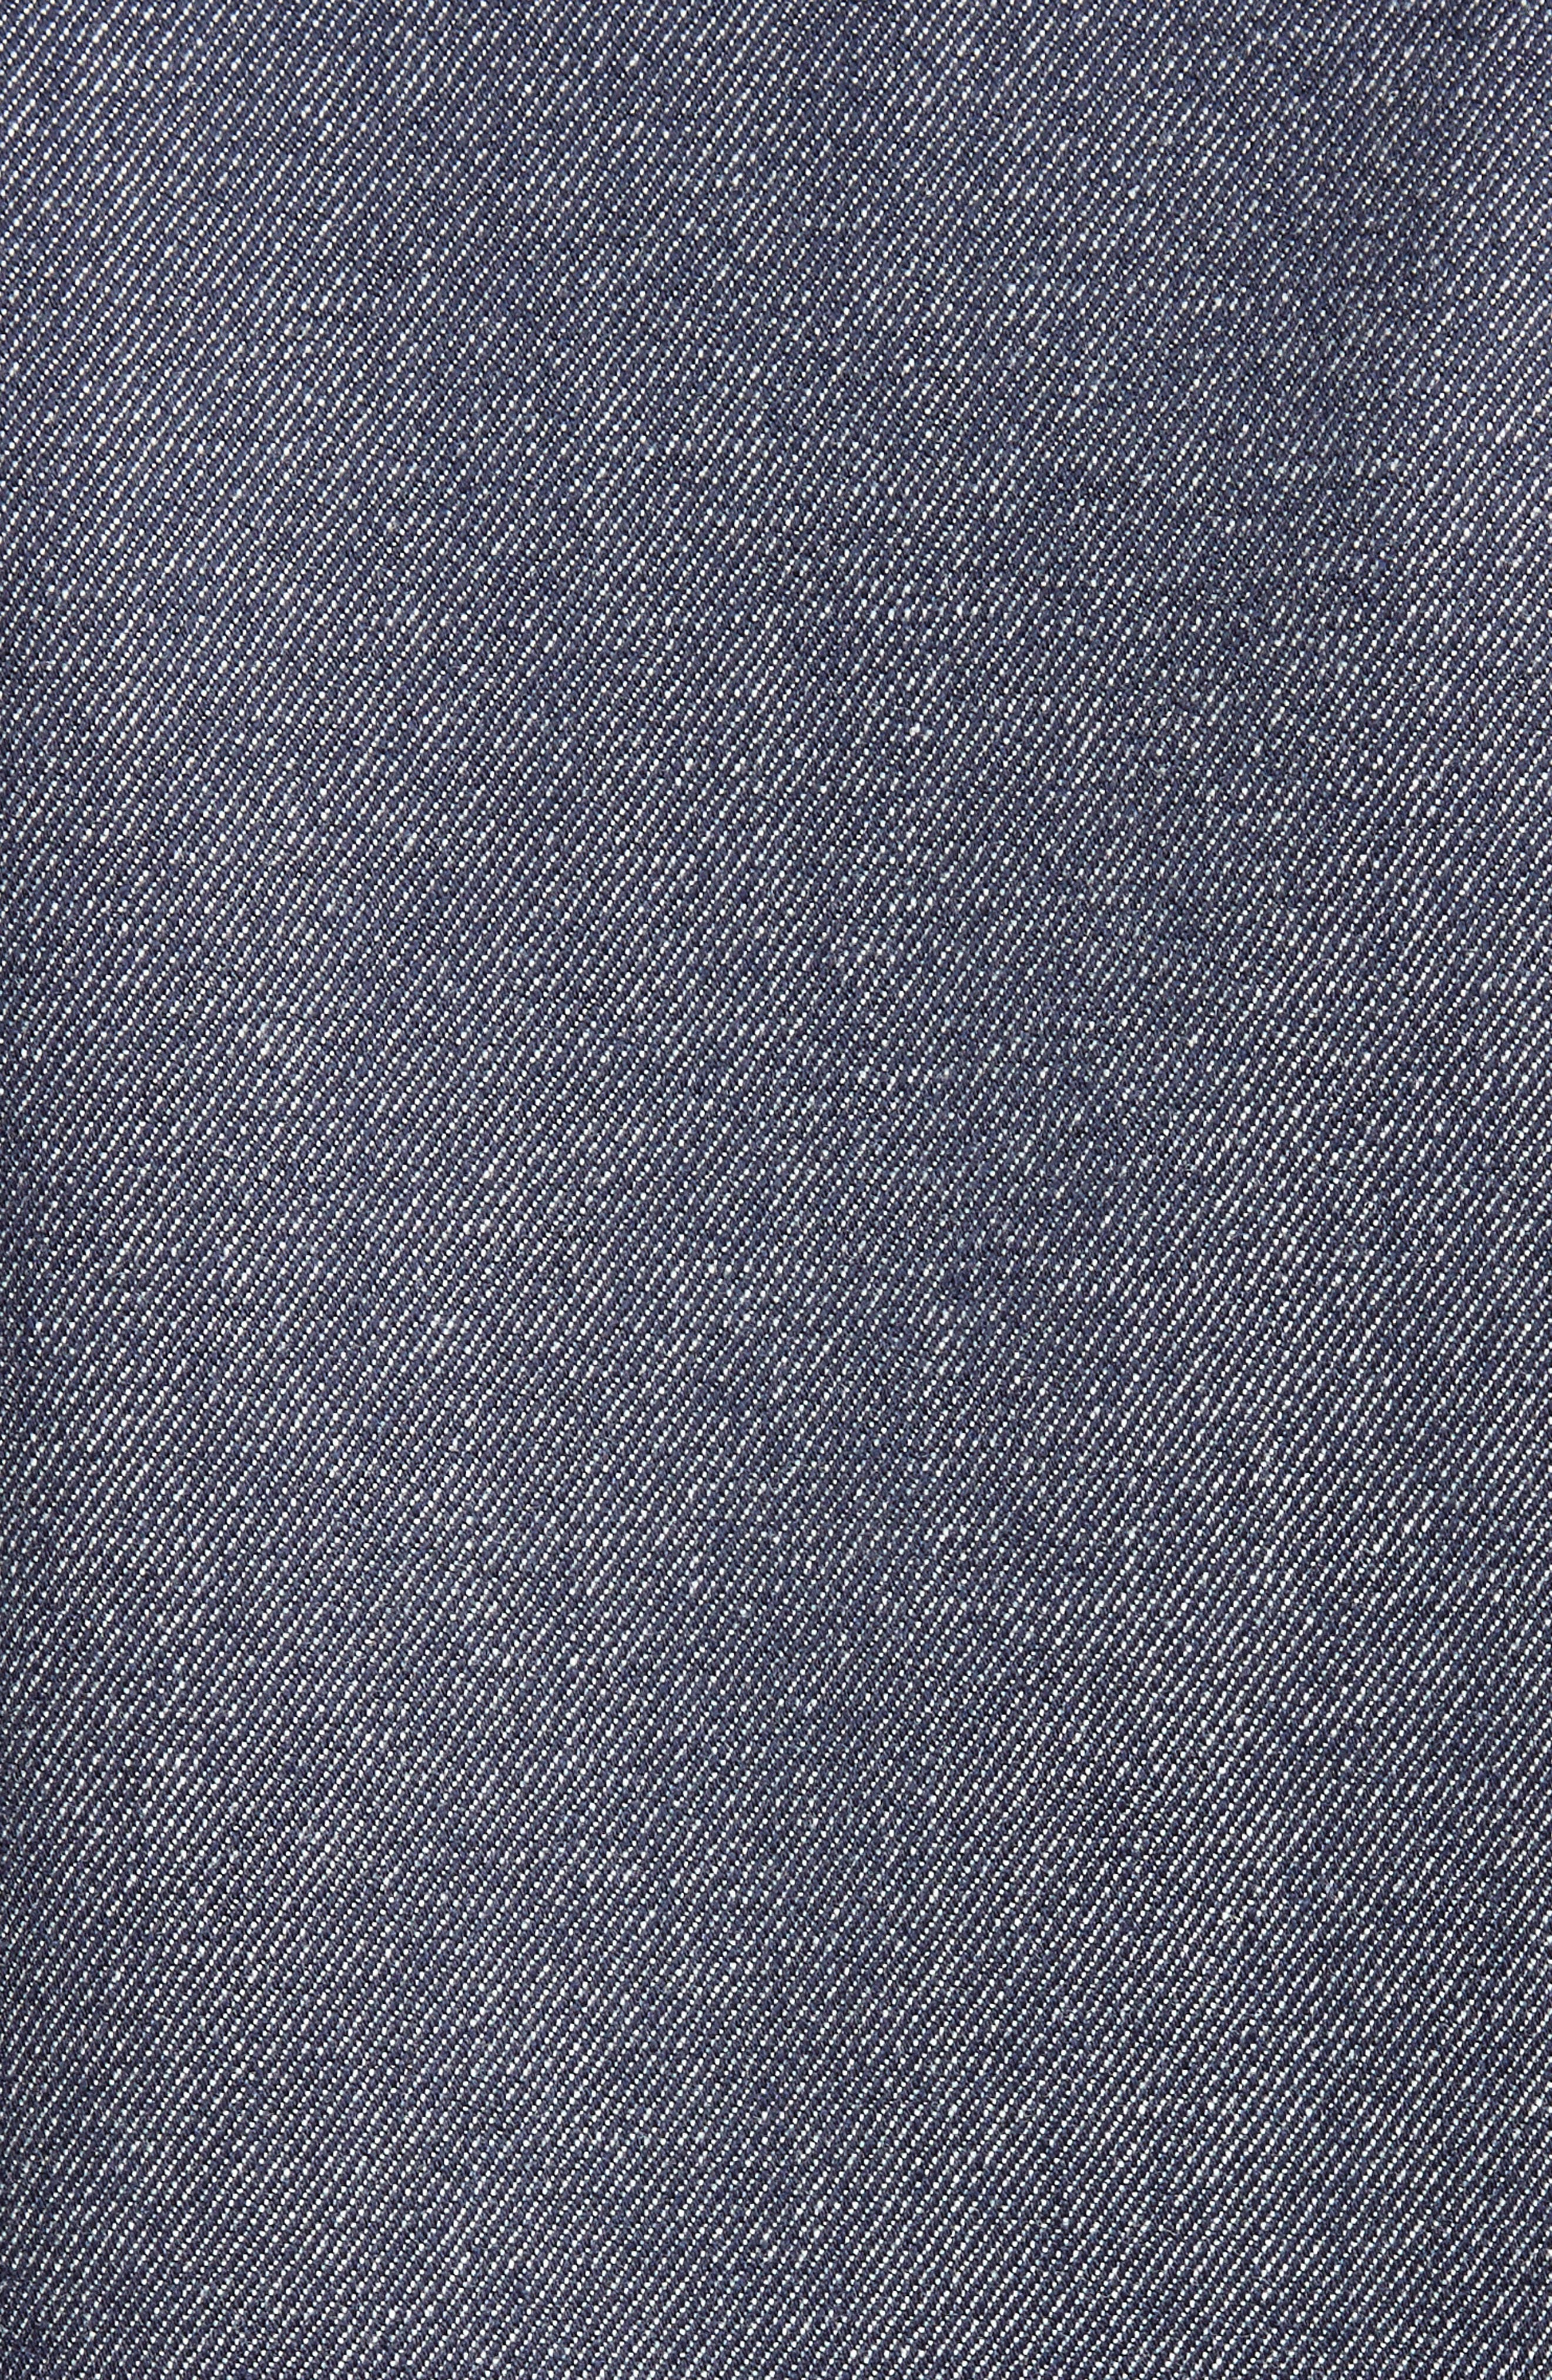 Raid Virgin Wool Tunic,                             Alternate thumbnail 5, color,